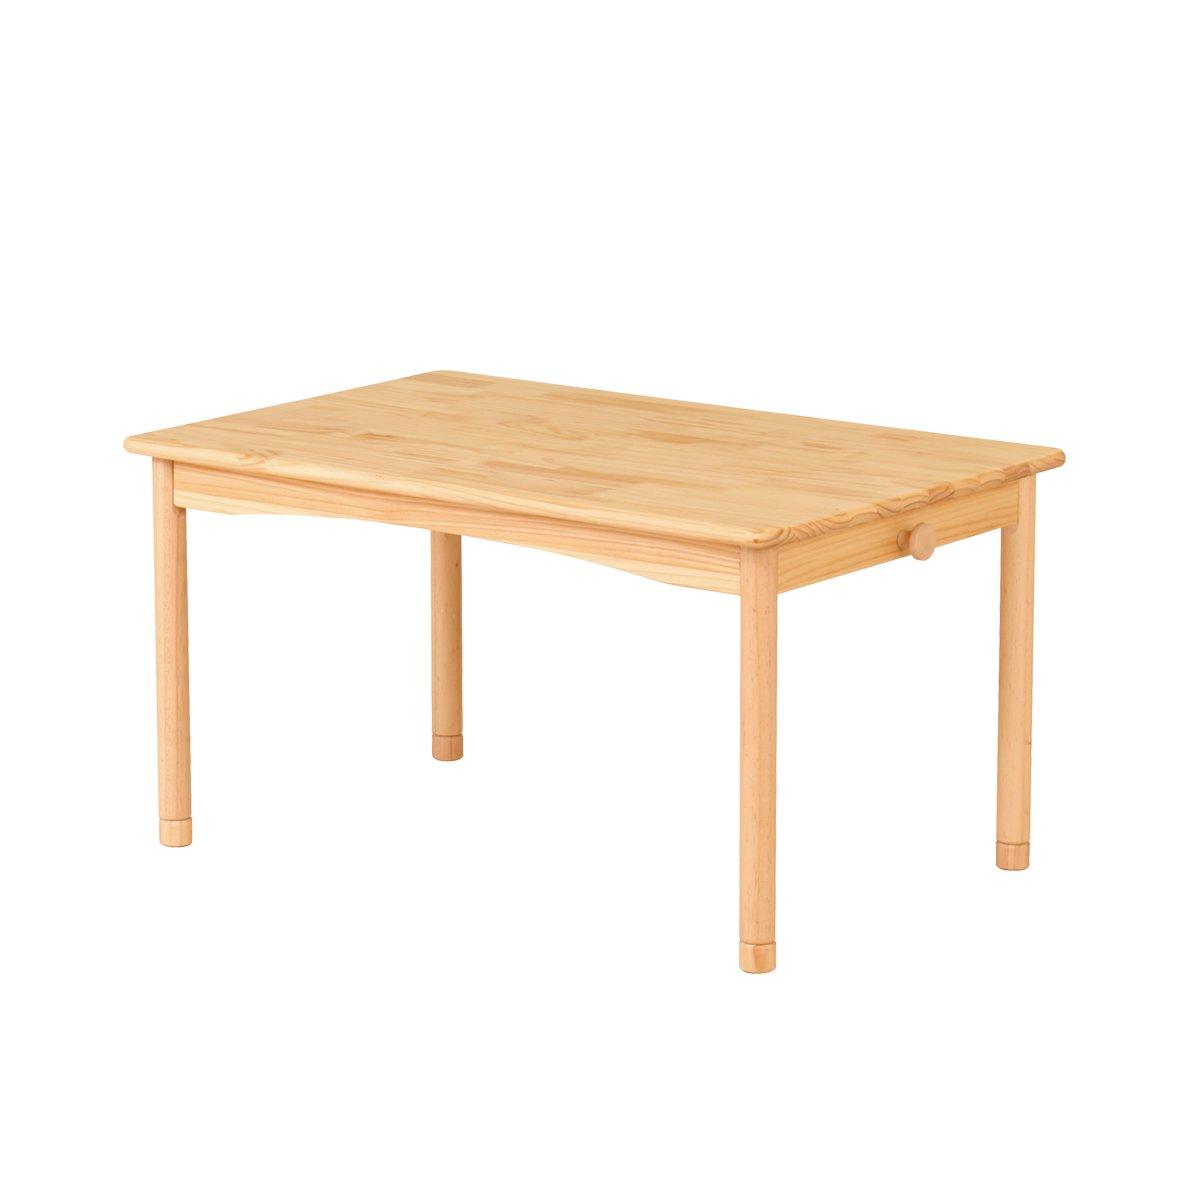 BEATON JAPAN キッズテーブル 子供 テーブル 机 天然木 ナチュラル 学習 (60cm) B078N1GXZ5 60cm 60cm